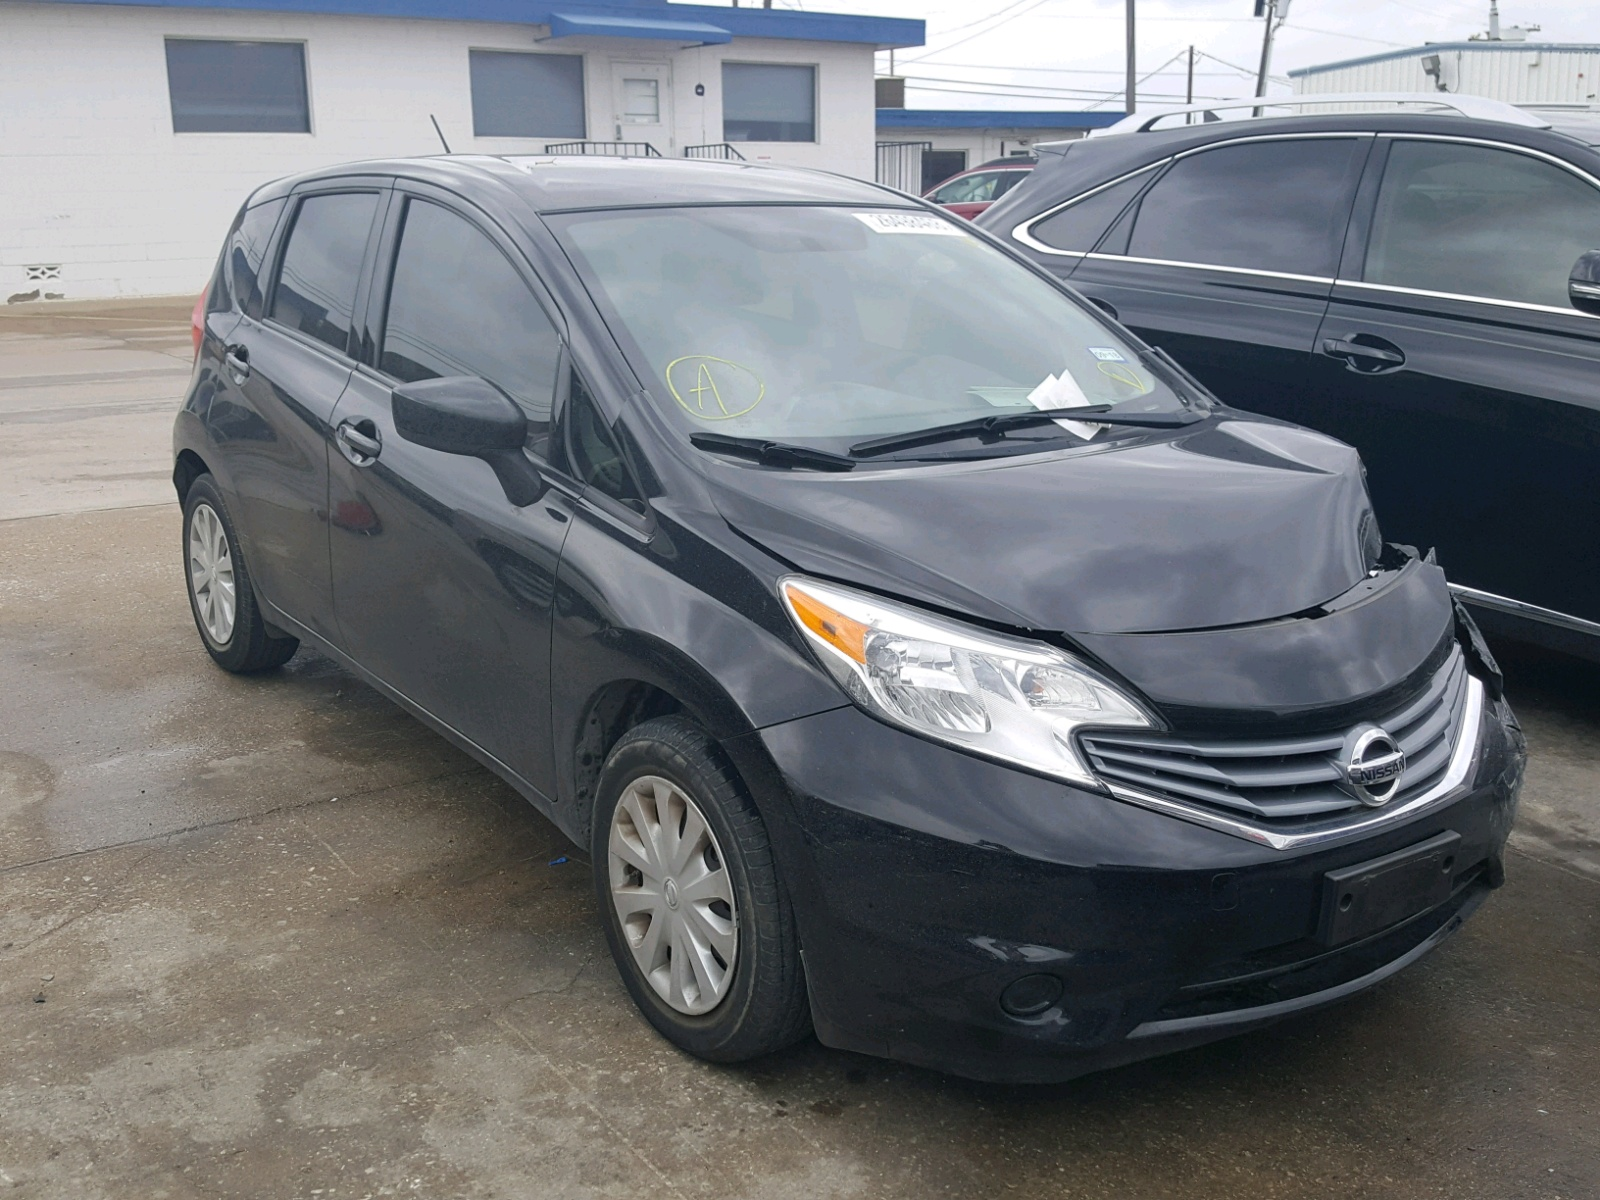 Auto Auction Ended On Vin 1n4al3ap1dn587218 2013 Nissan